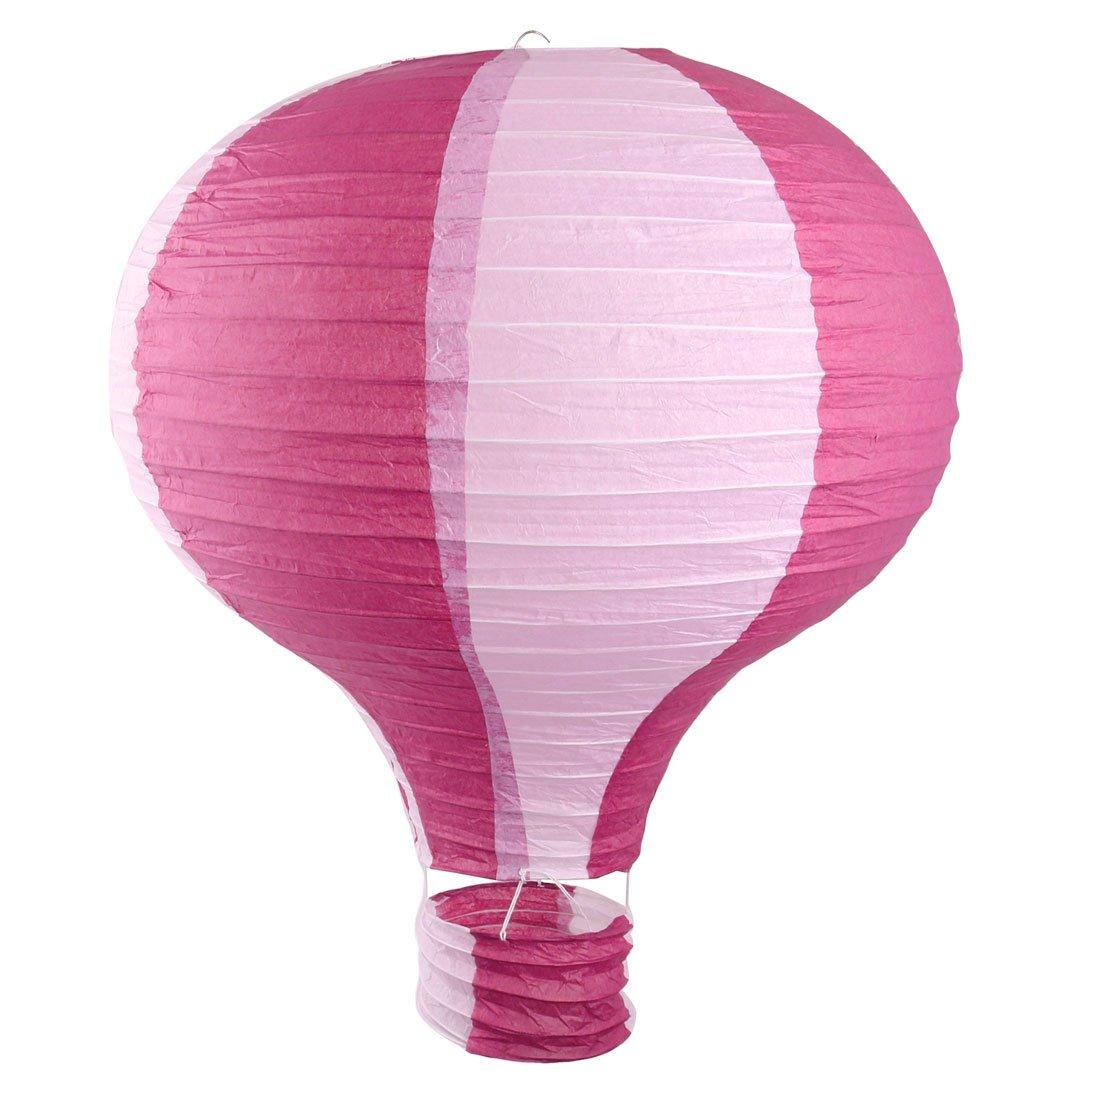 uxcell Paper Household Party Lightless Hanging DIY Decor Hot Air Balloon Lantern 16 Inch Dia Fuchsia White